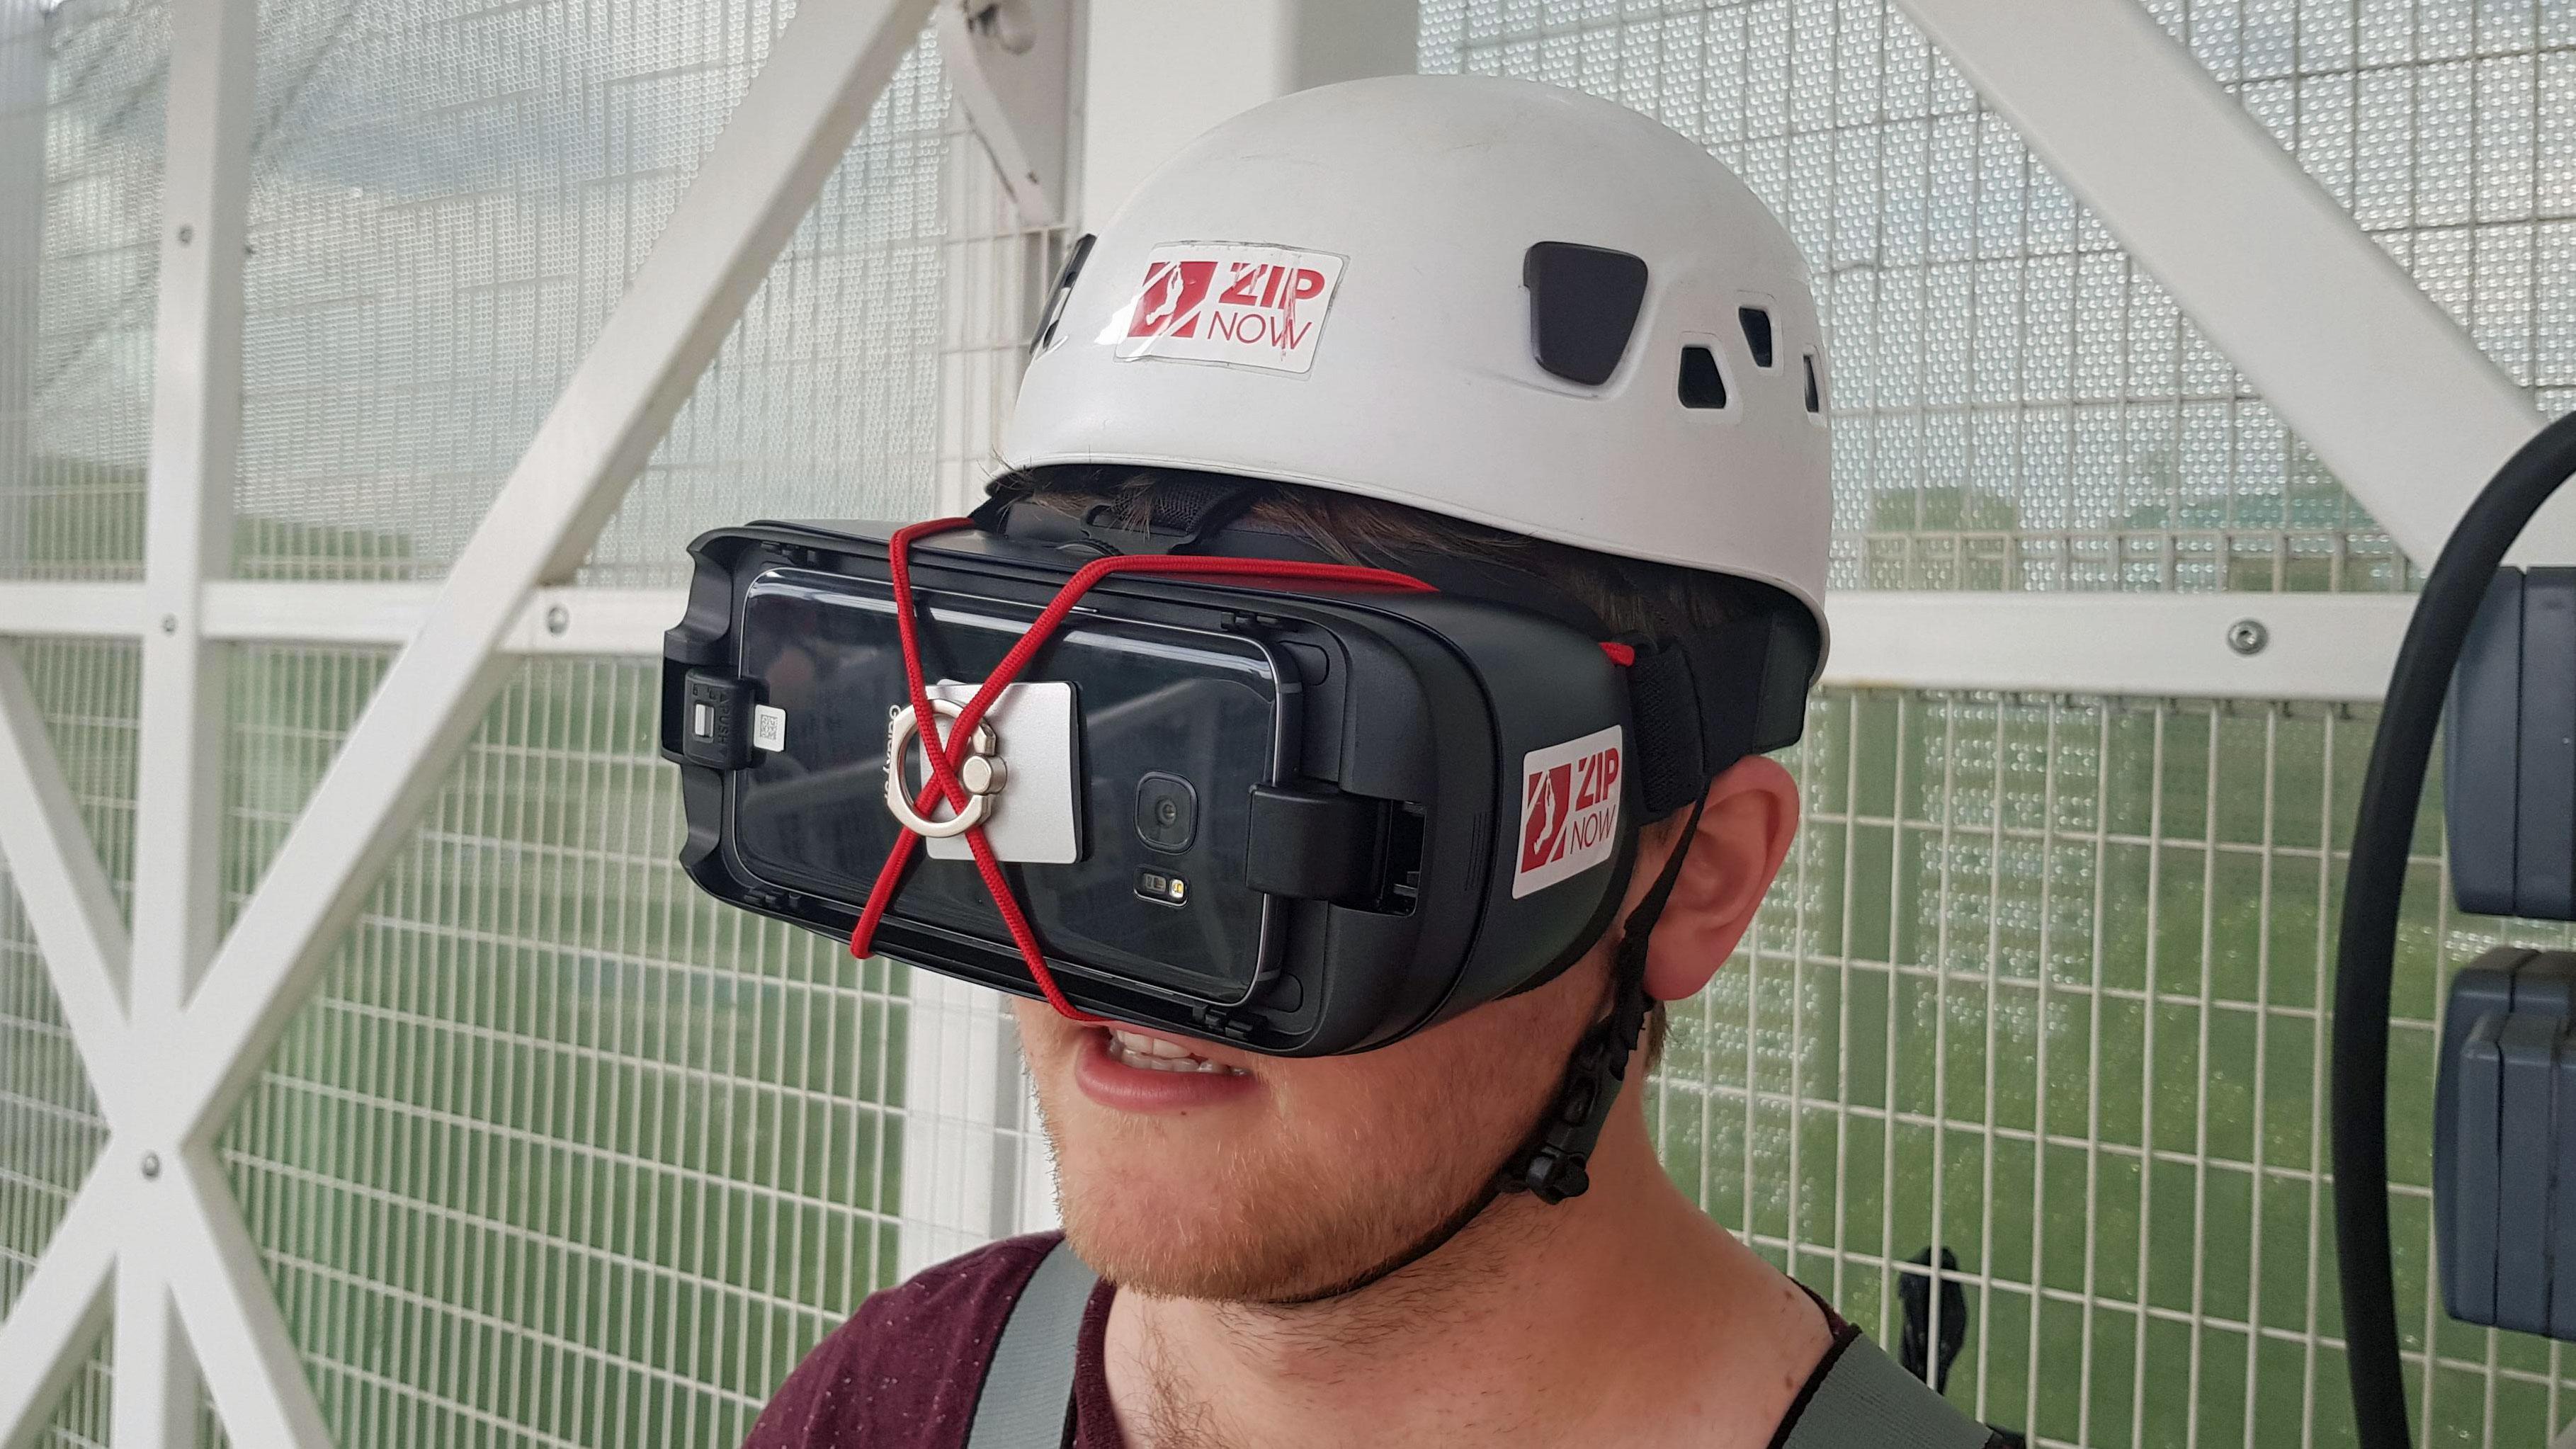 I rode half of the world\'s longest zipline in virtual reality